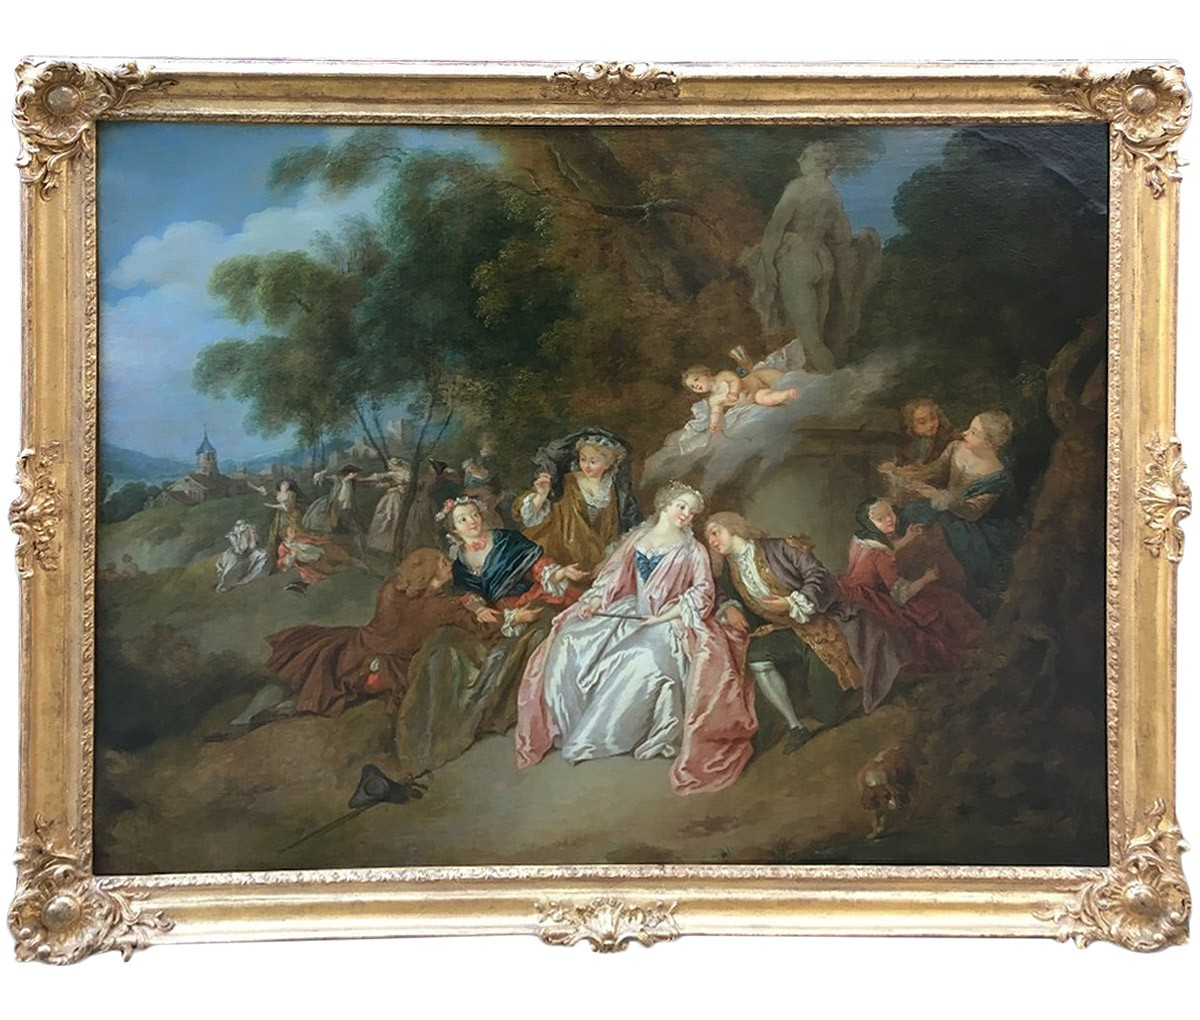 Scène galante, 18eme siècle